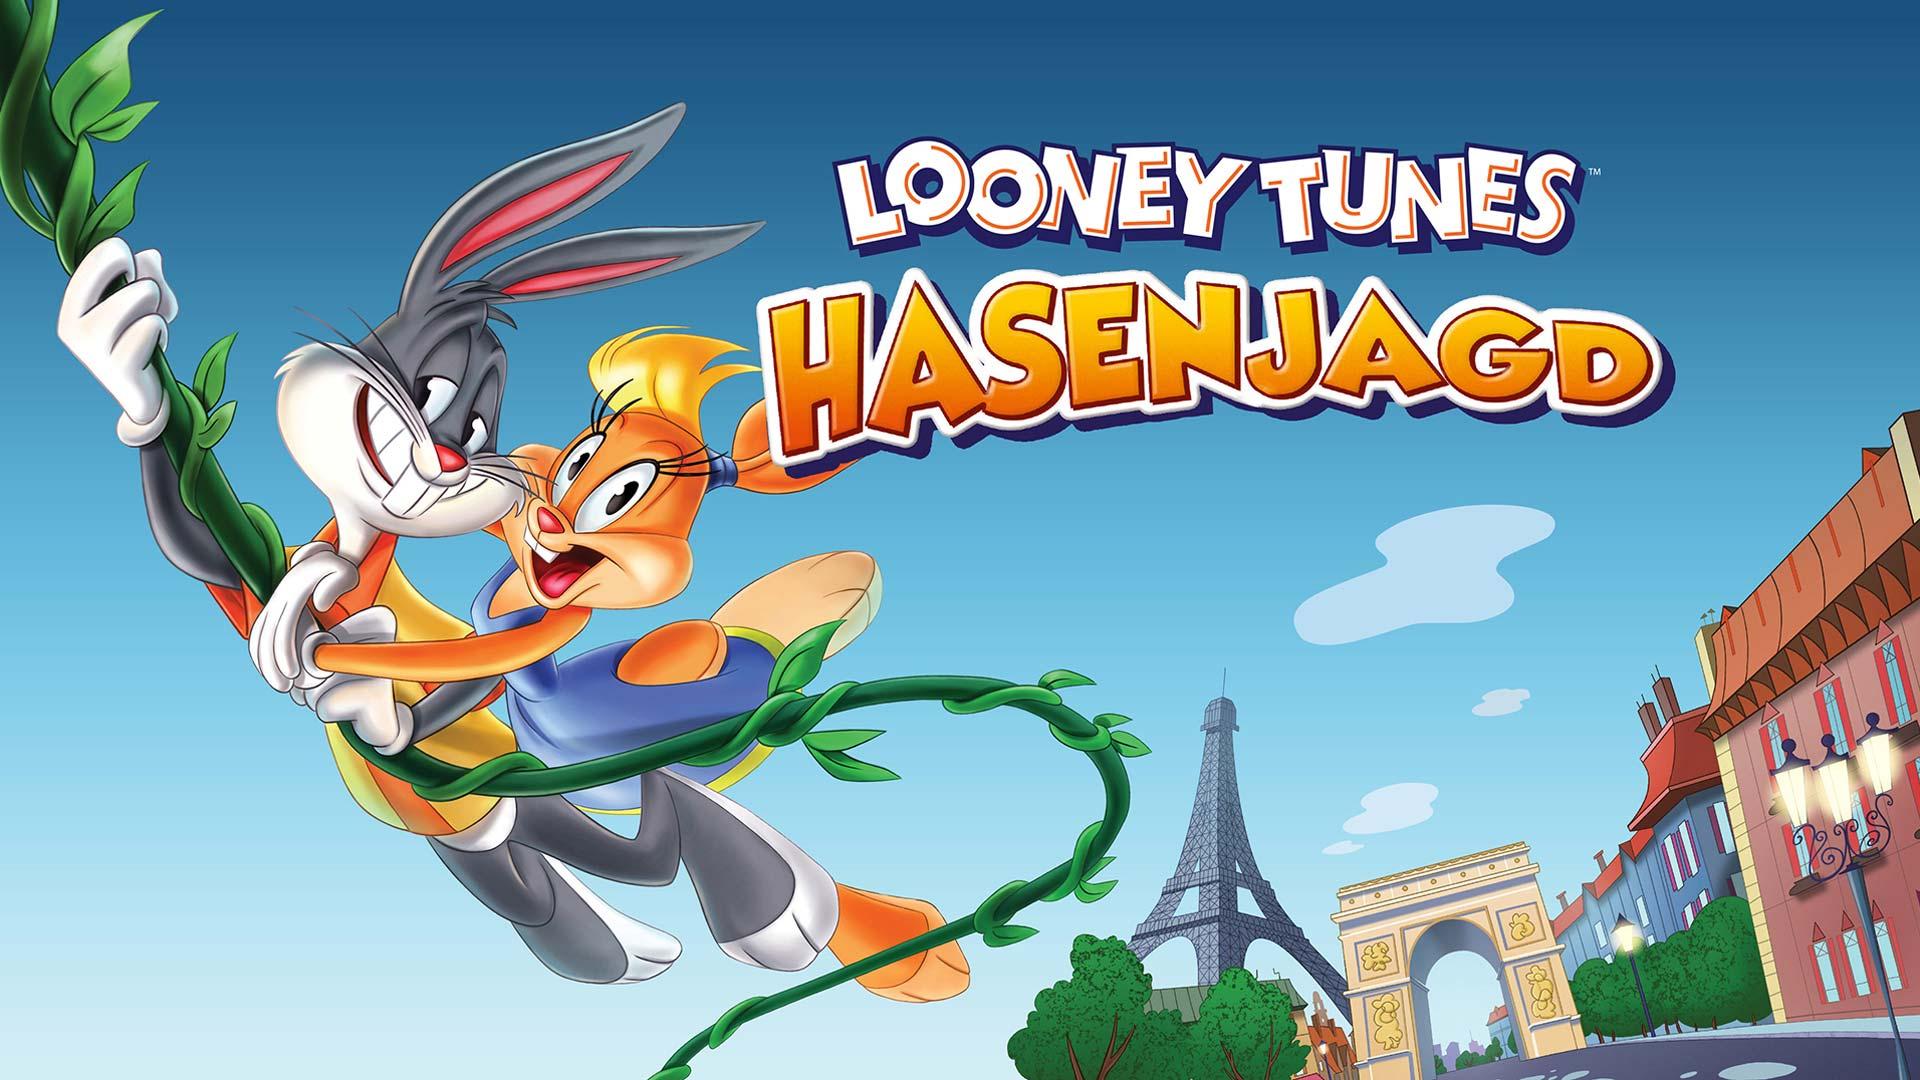 looney-tunes-hasenjagd